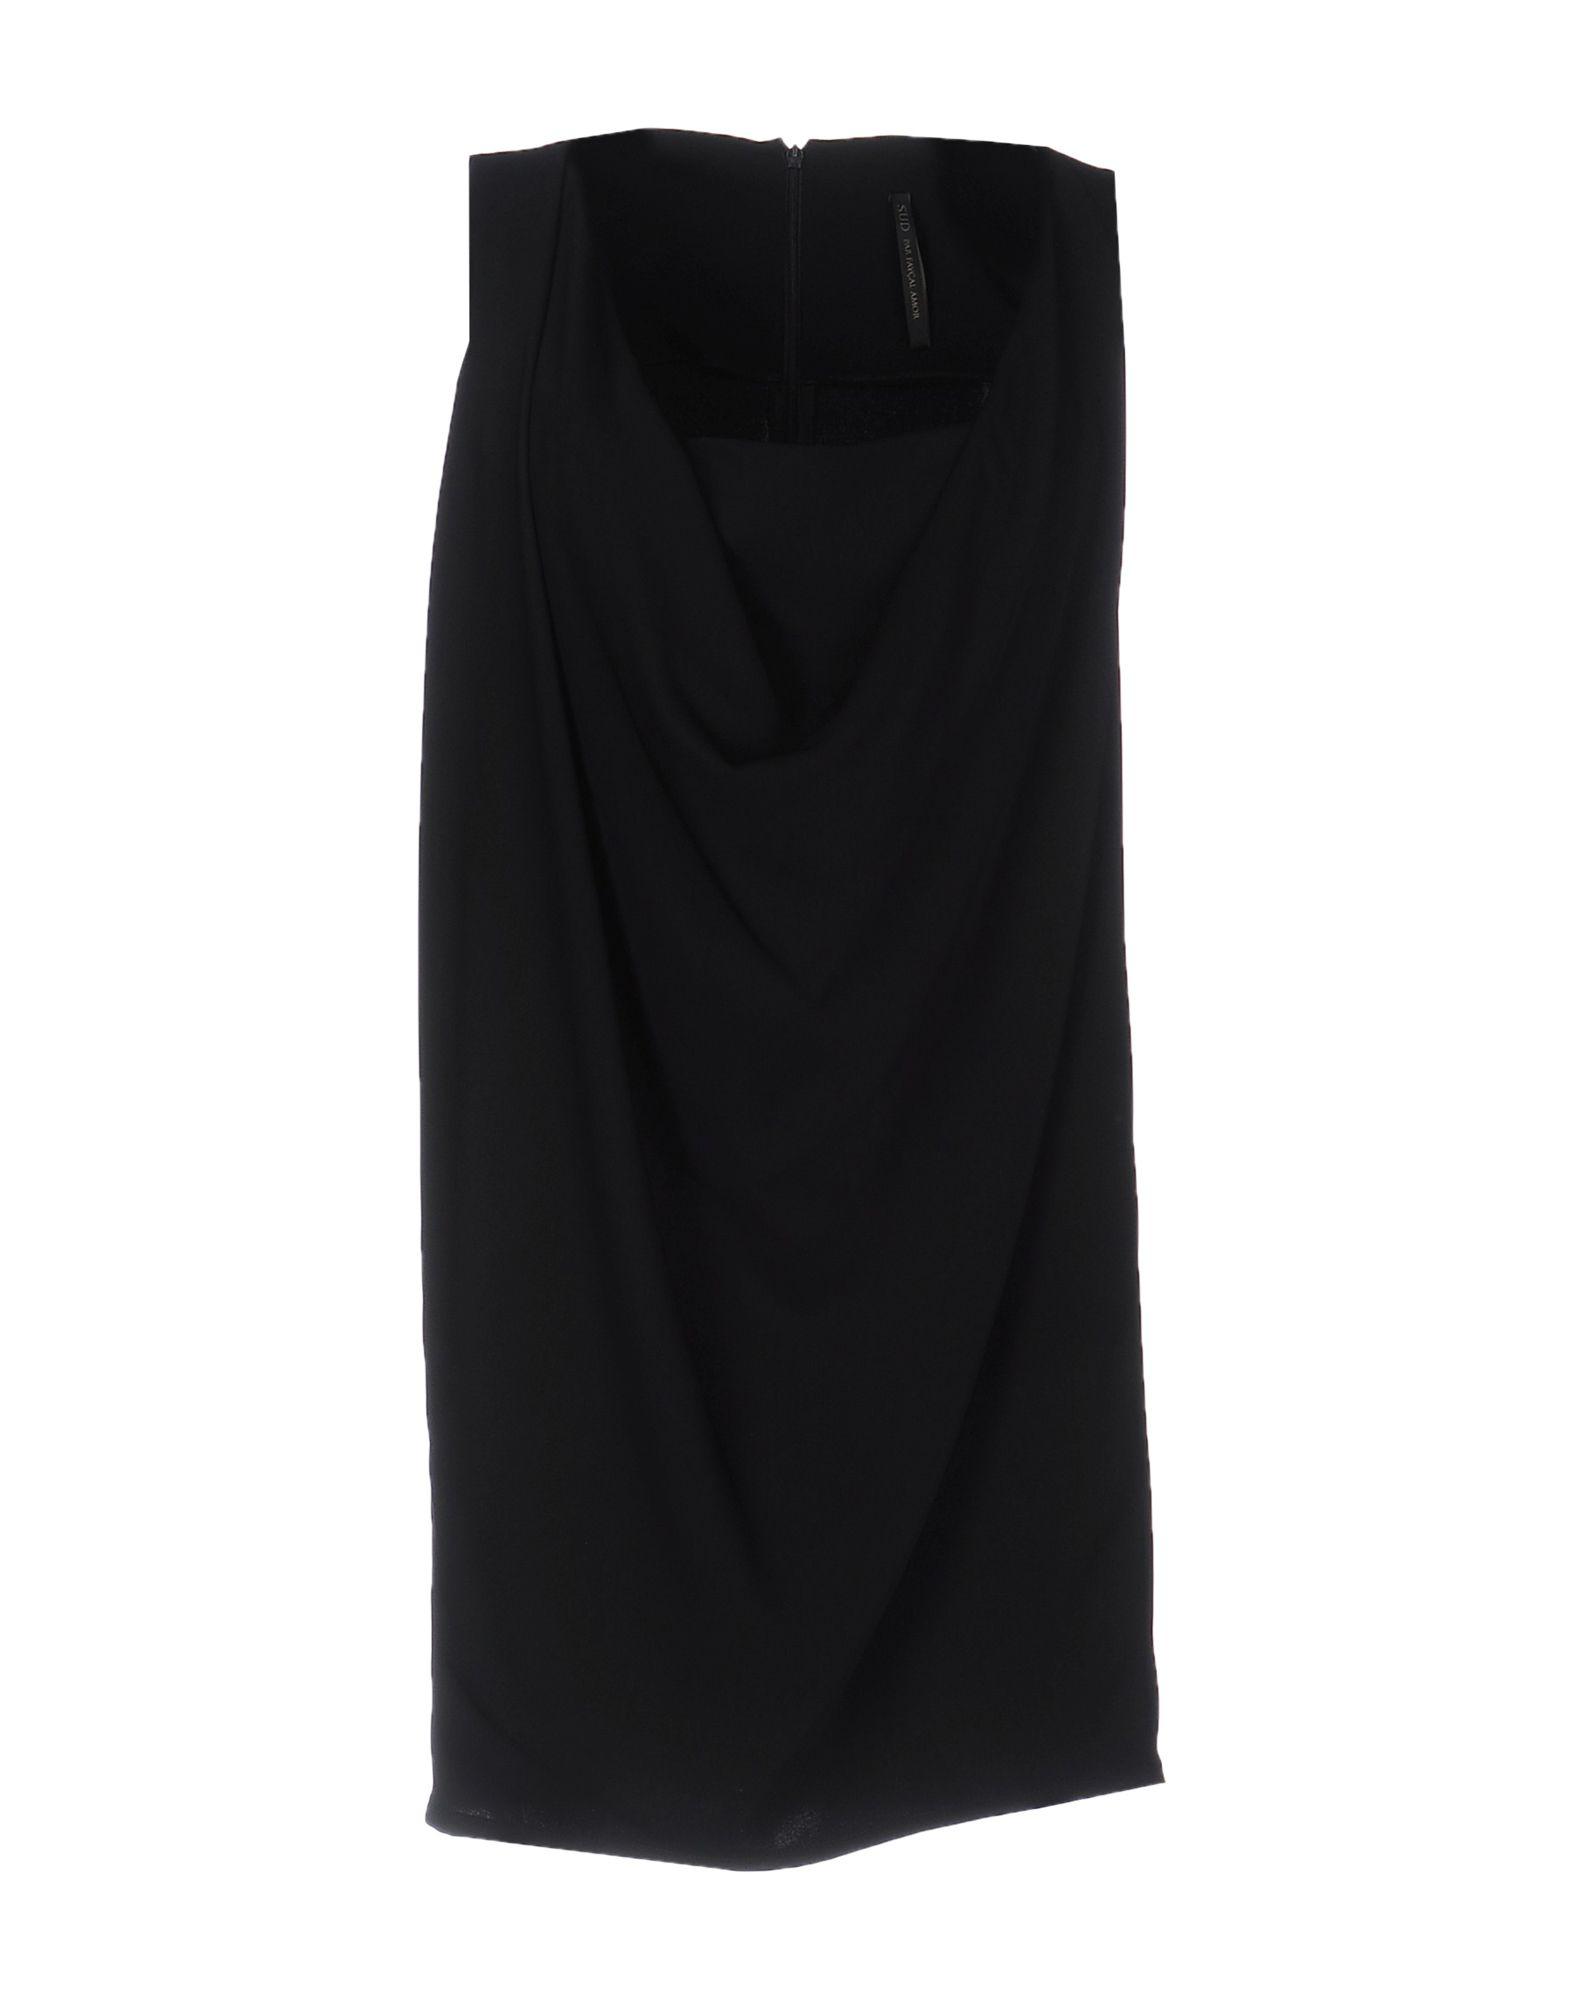 PLEIN SUD PAR FAYҪAL AMOR Короткое платье cacharel туалетная вода женская amor amor l eau 50 мл os